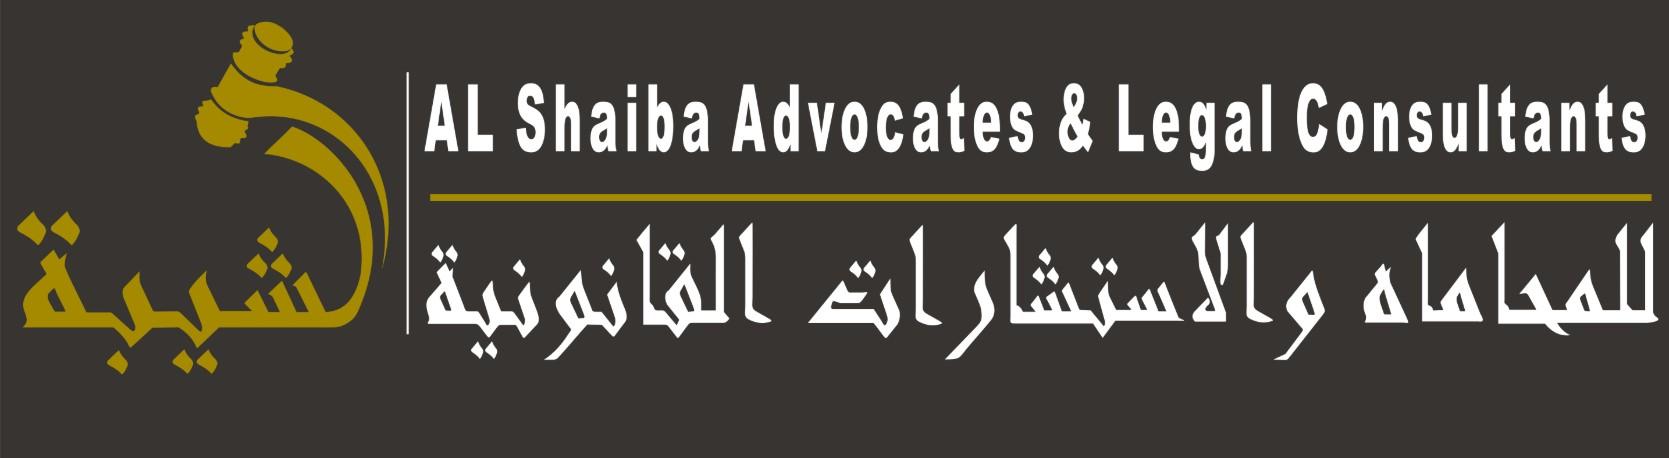 Al Shaiba Advocates & Legal Consultants - Labour, Family, Civil, Criminal and Property Lawyers